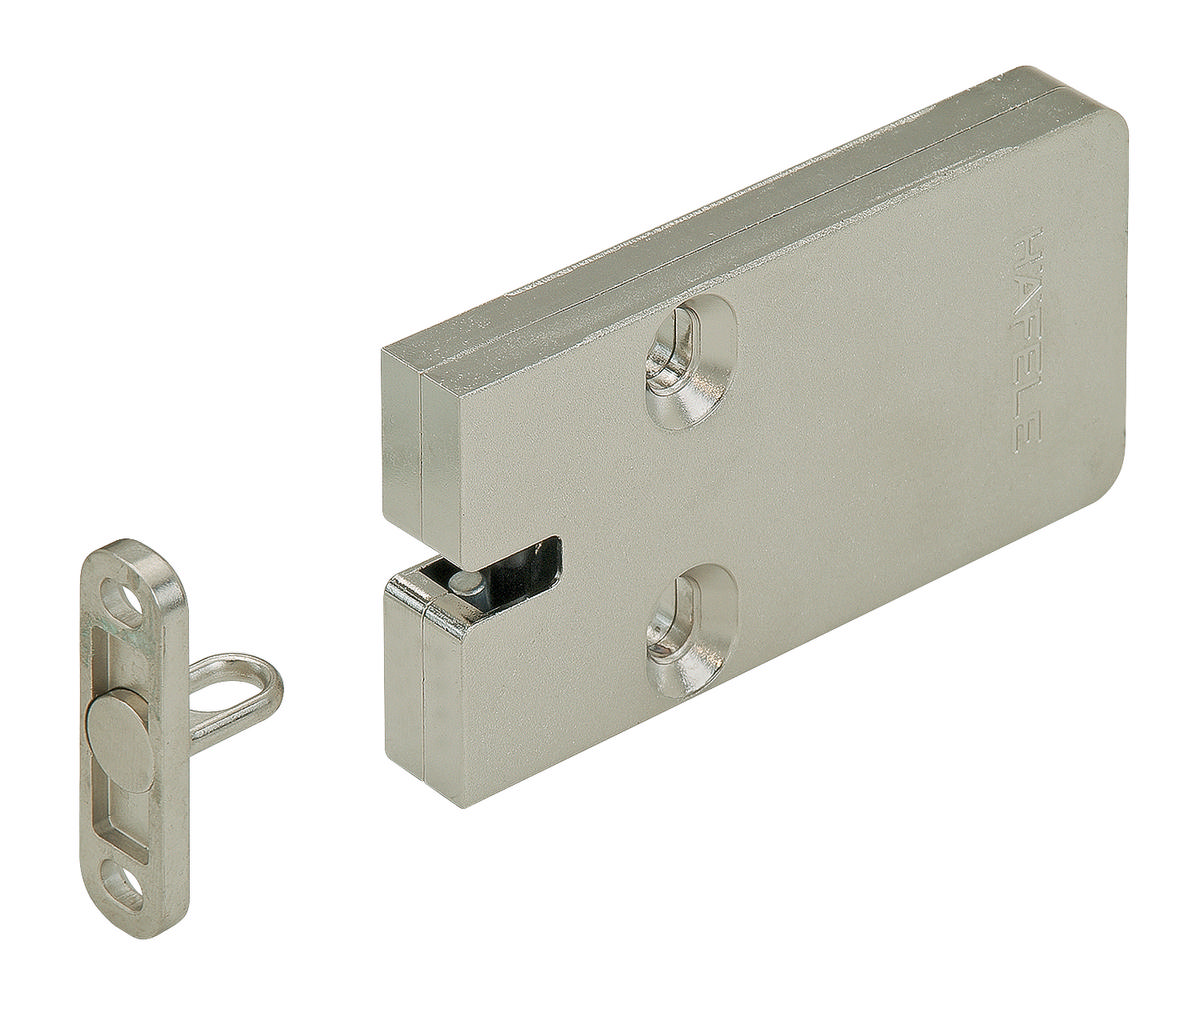 Hafele 237.56.304 Electric Furniture Lock